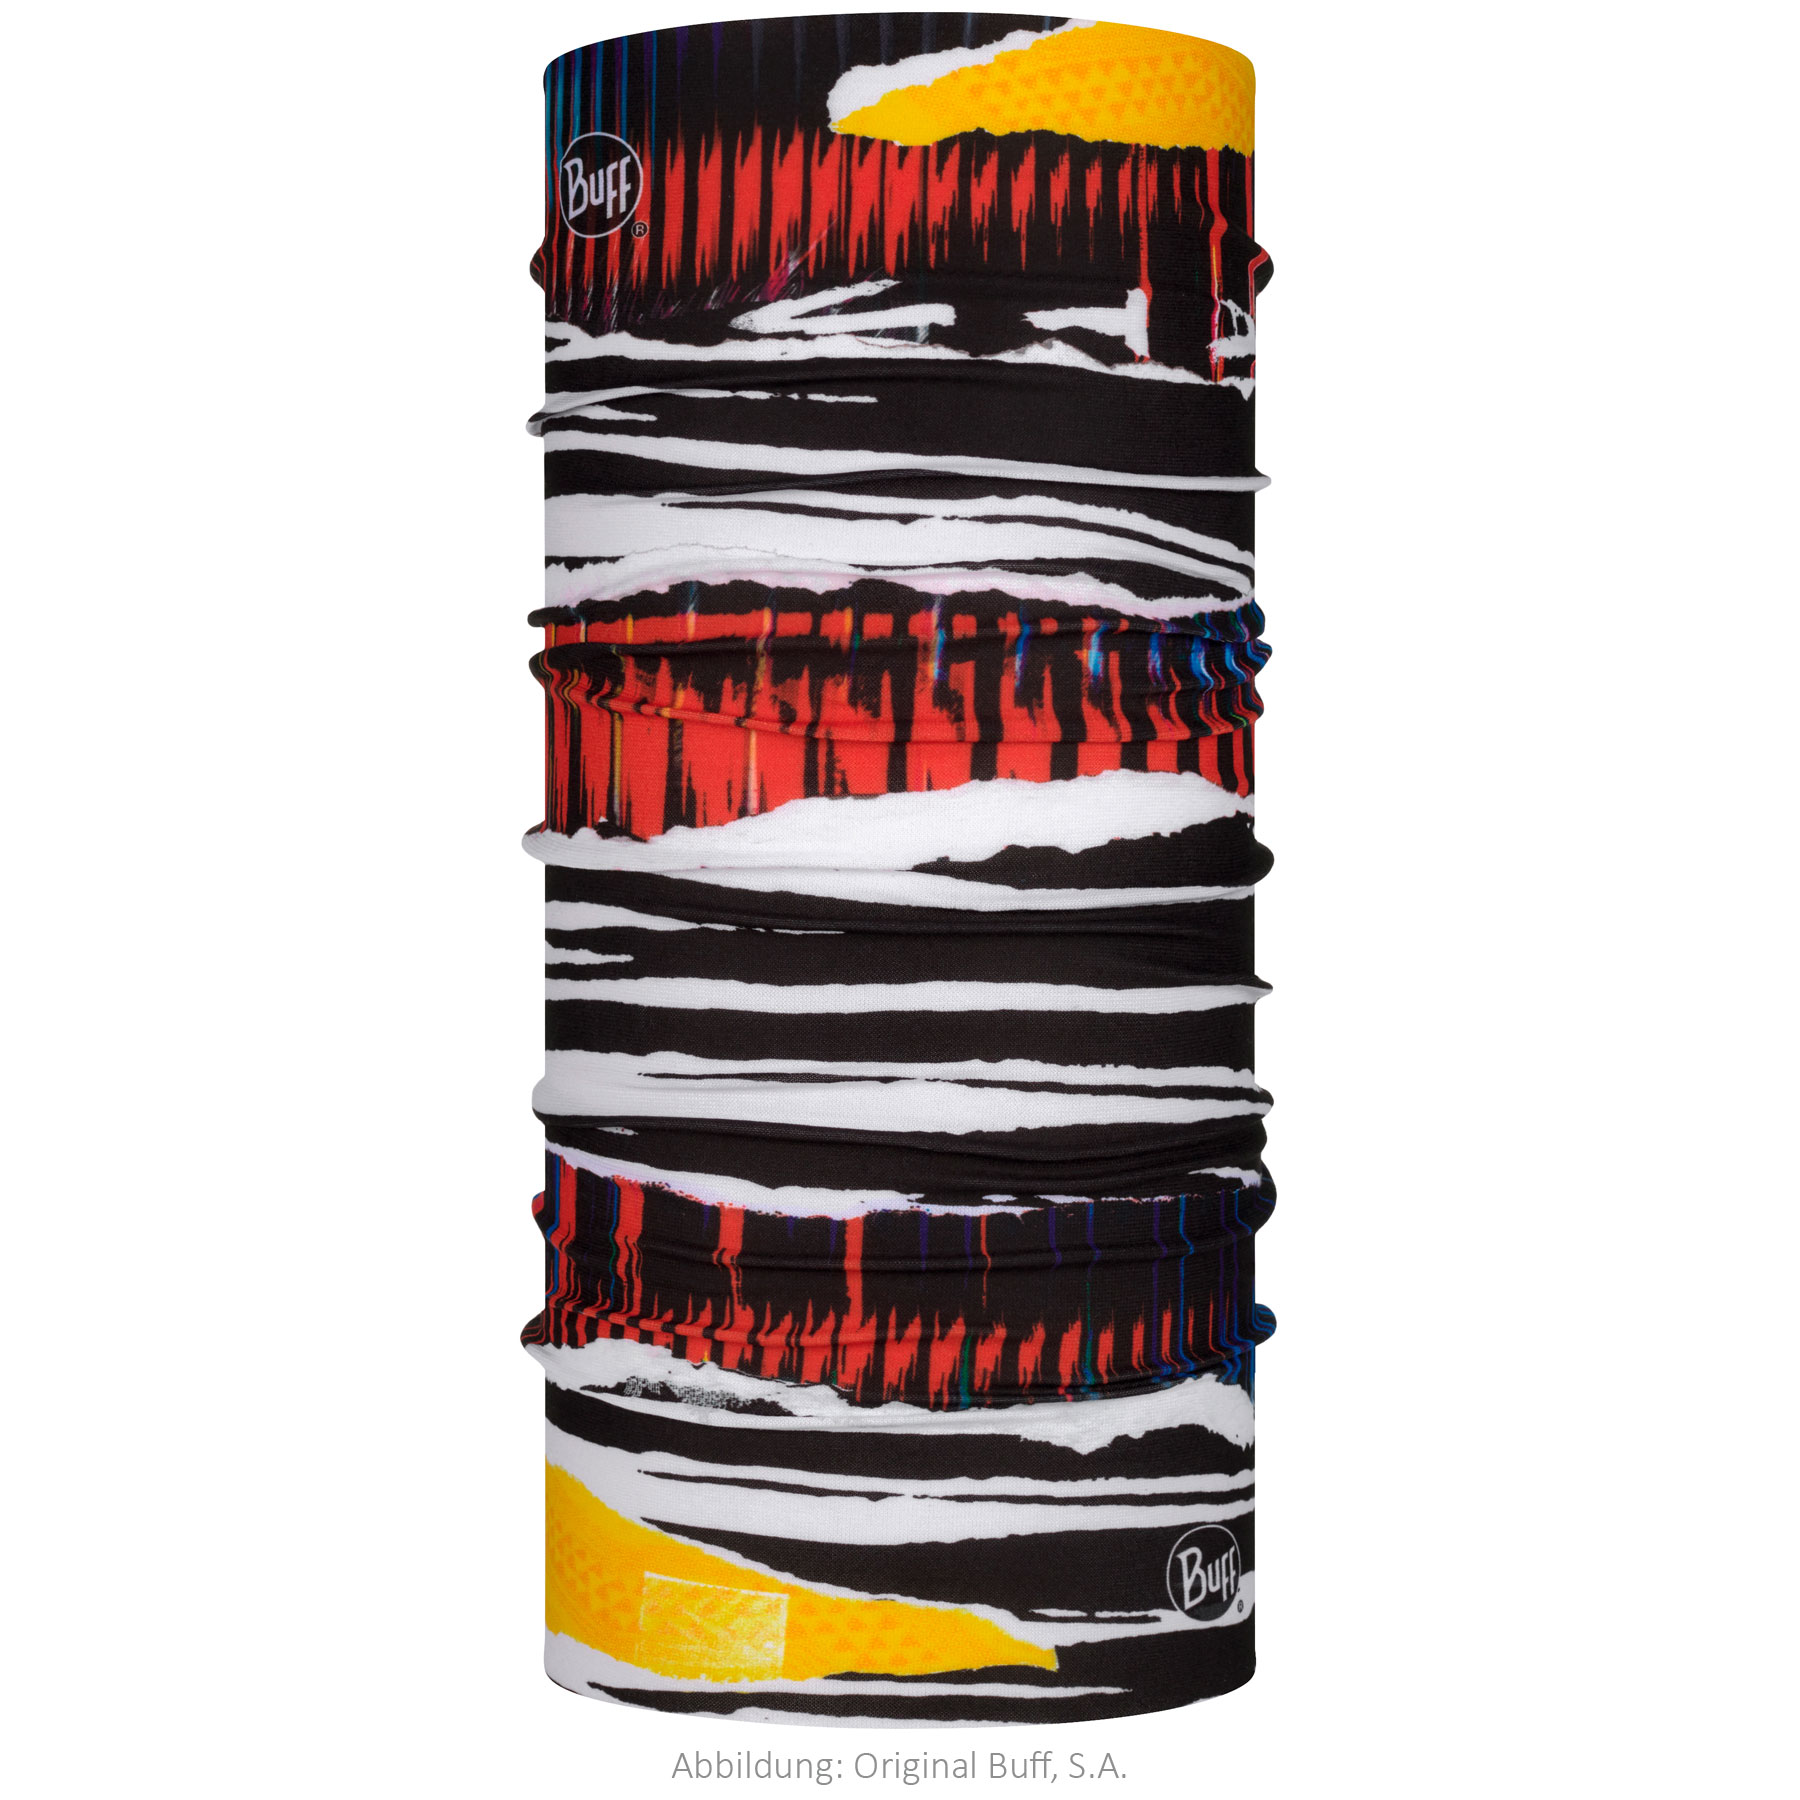 Buff® Original Multifunctional Cloth - Streaks Multi